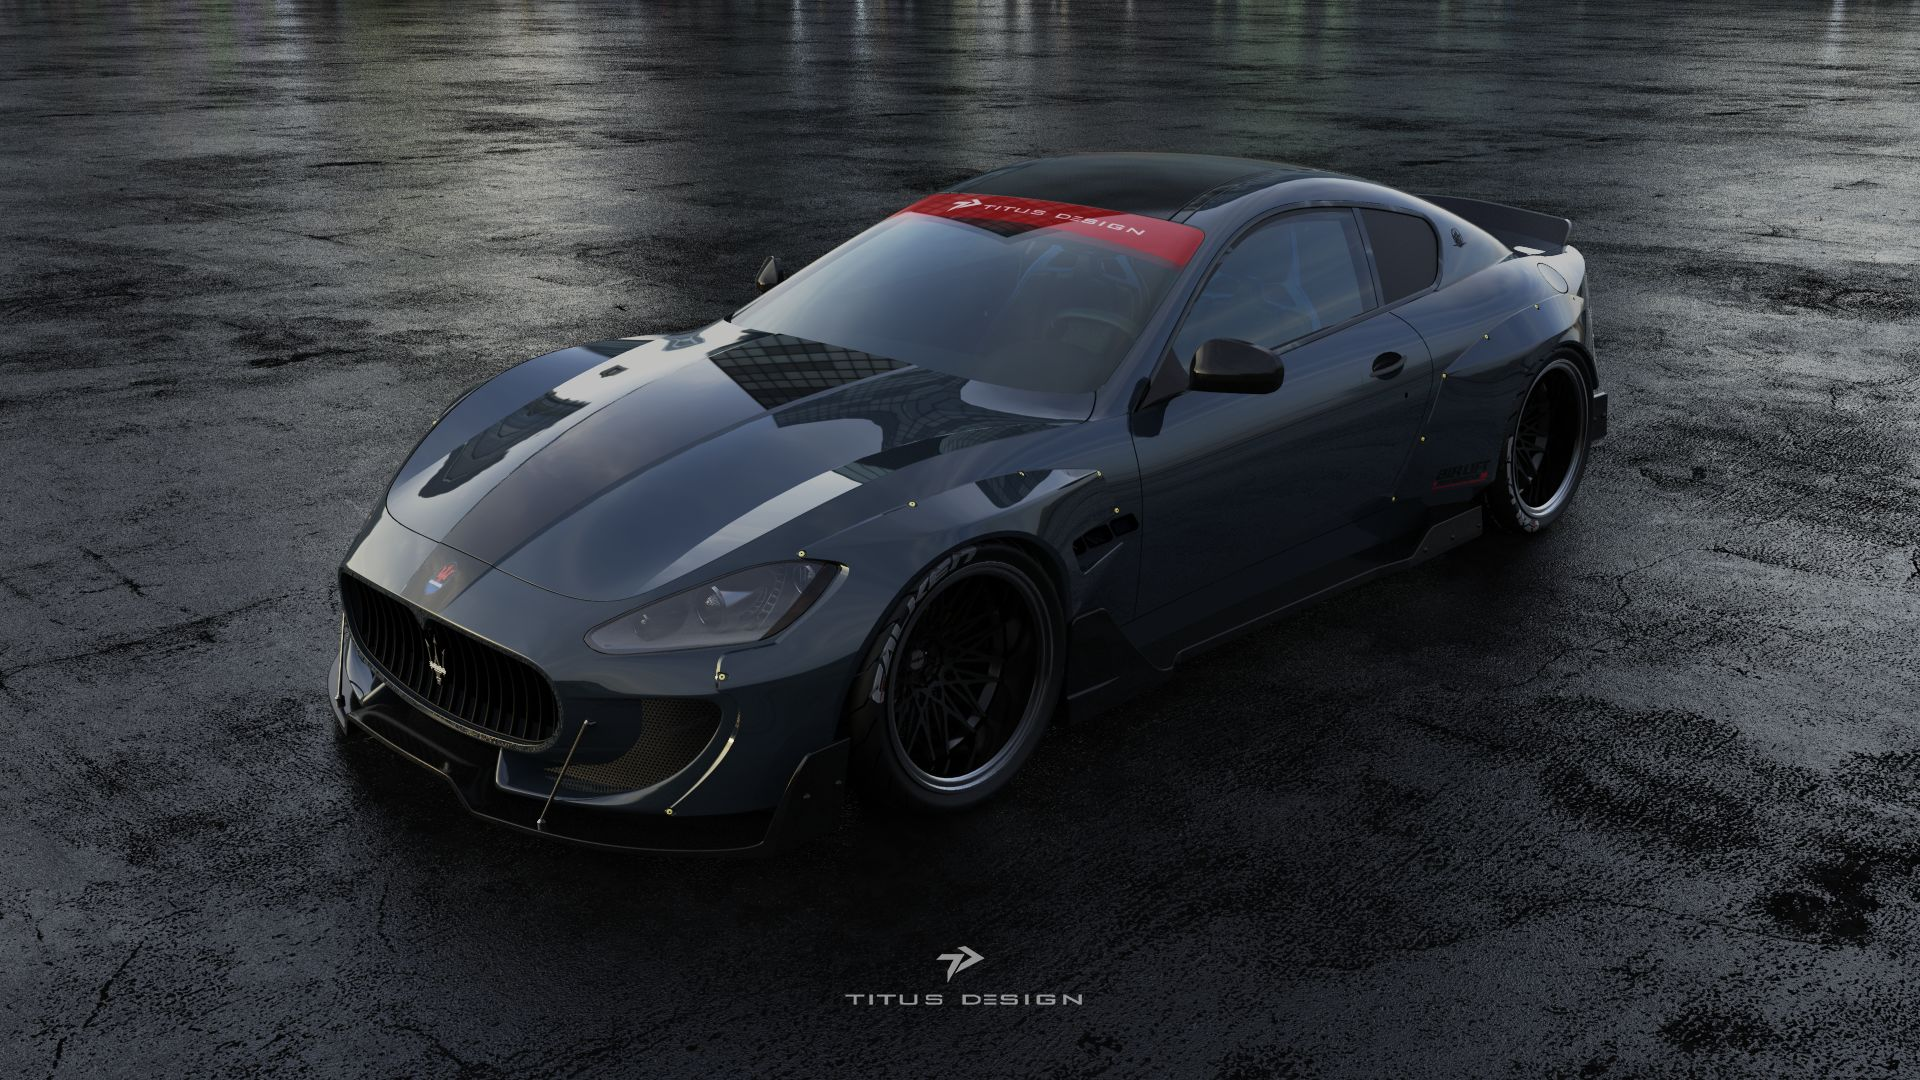 Maserati-gt-16-4-3500-3500